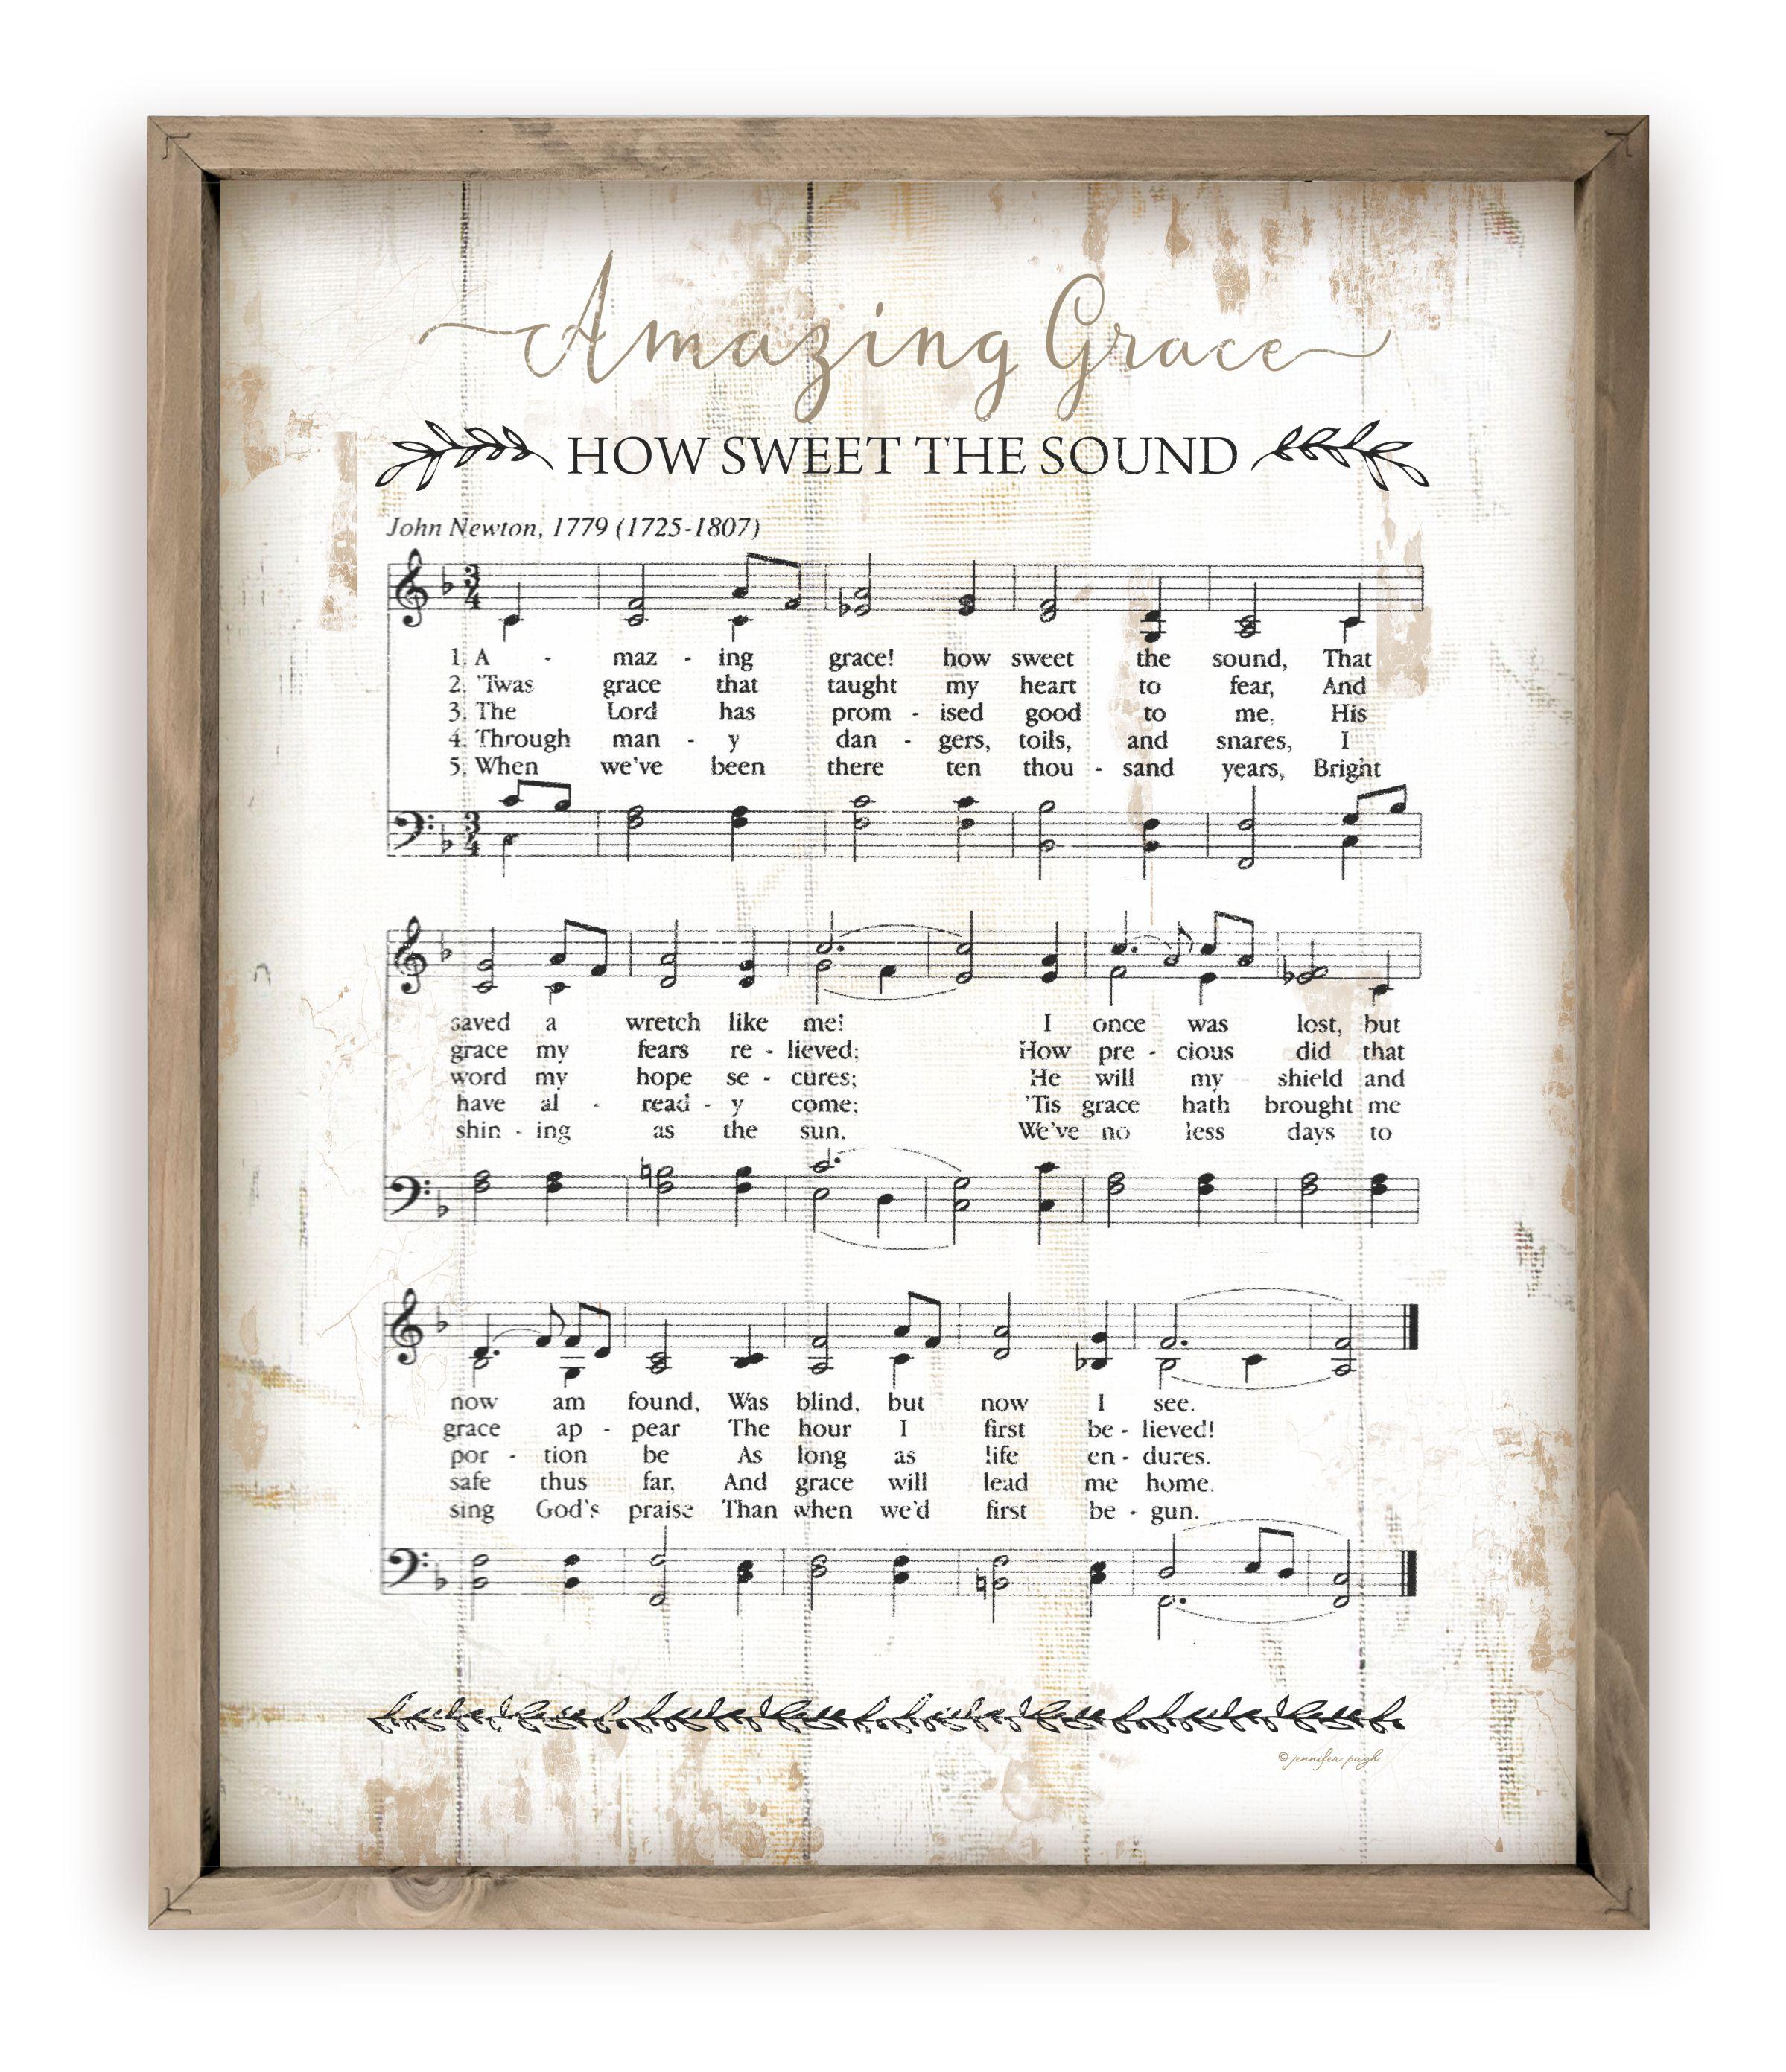 tp1215-16-fr-amazing-grace-sheet-music.jpg